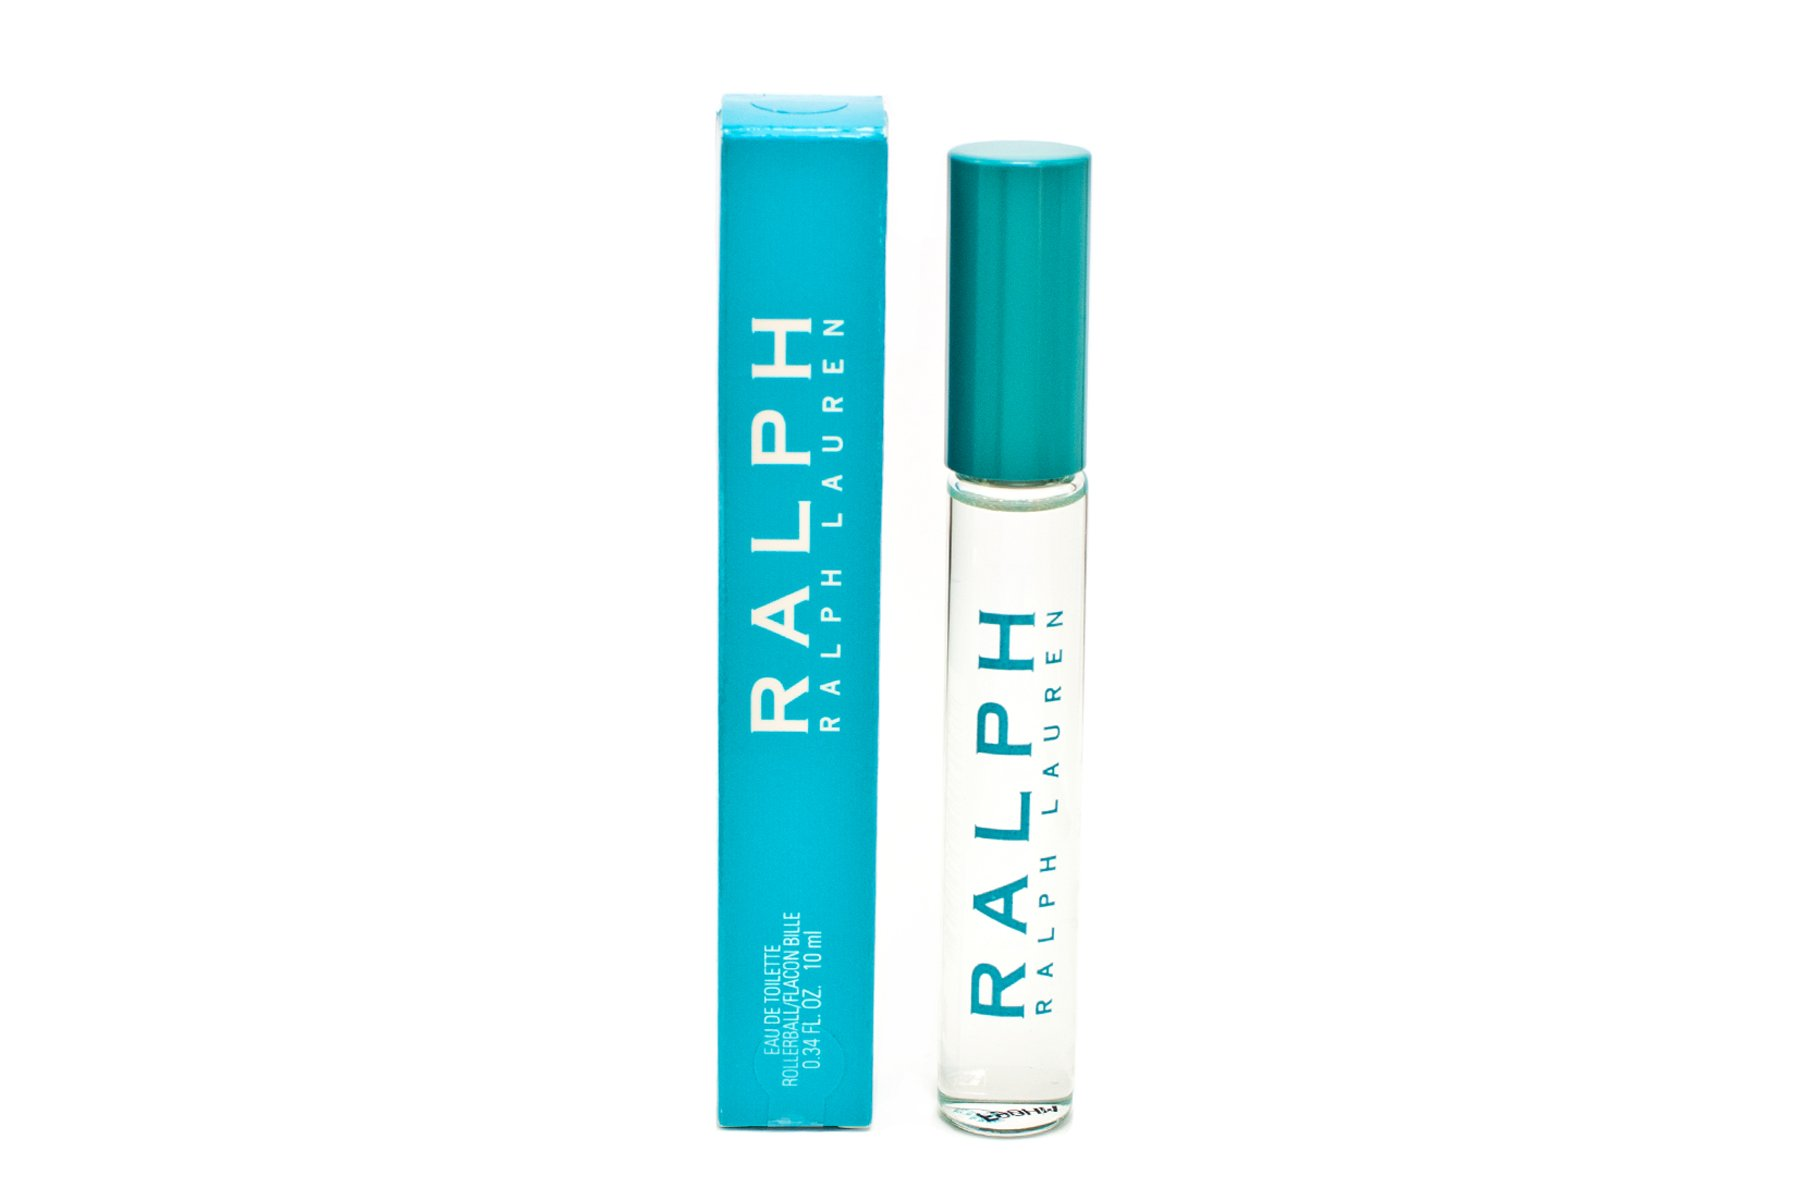 Ralph Lauren Ralph 0.25 oz Eau de Toilette Rollerball e2556d19edae9